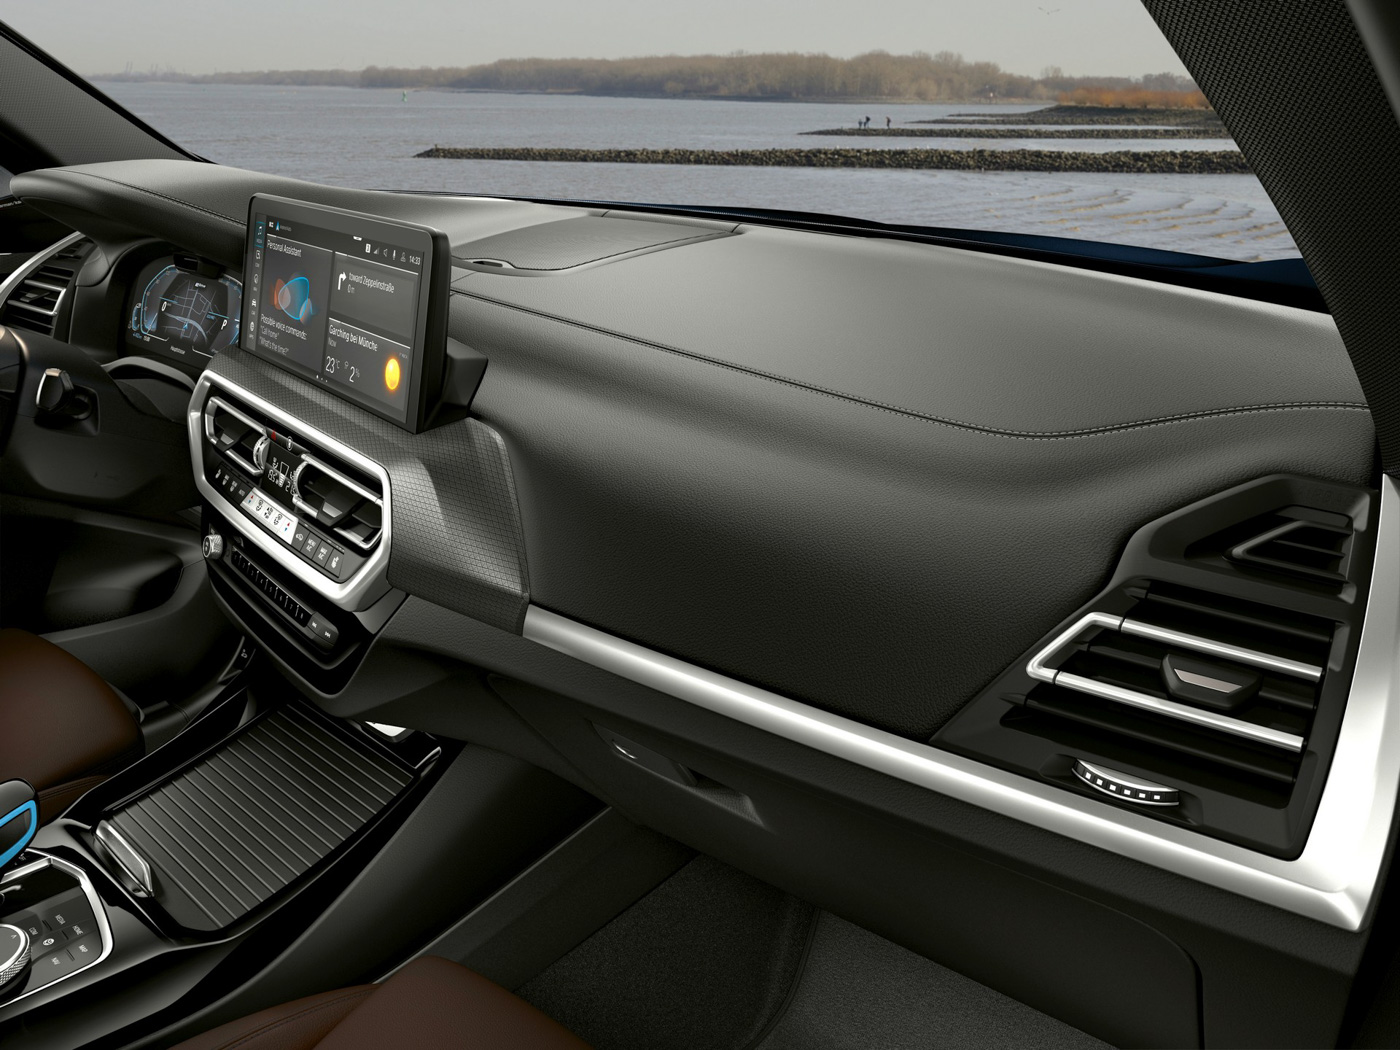 BMW iX3 2022 (8).JPG